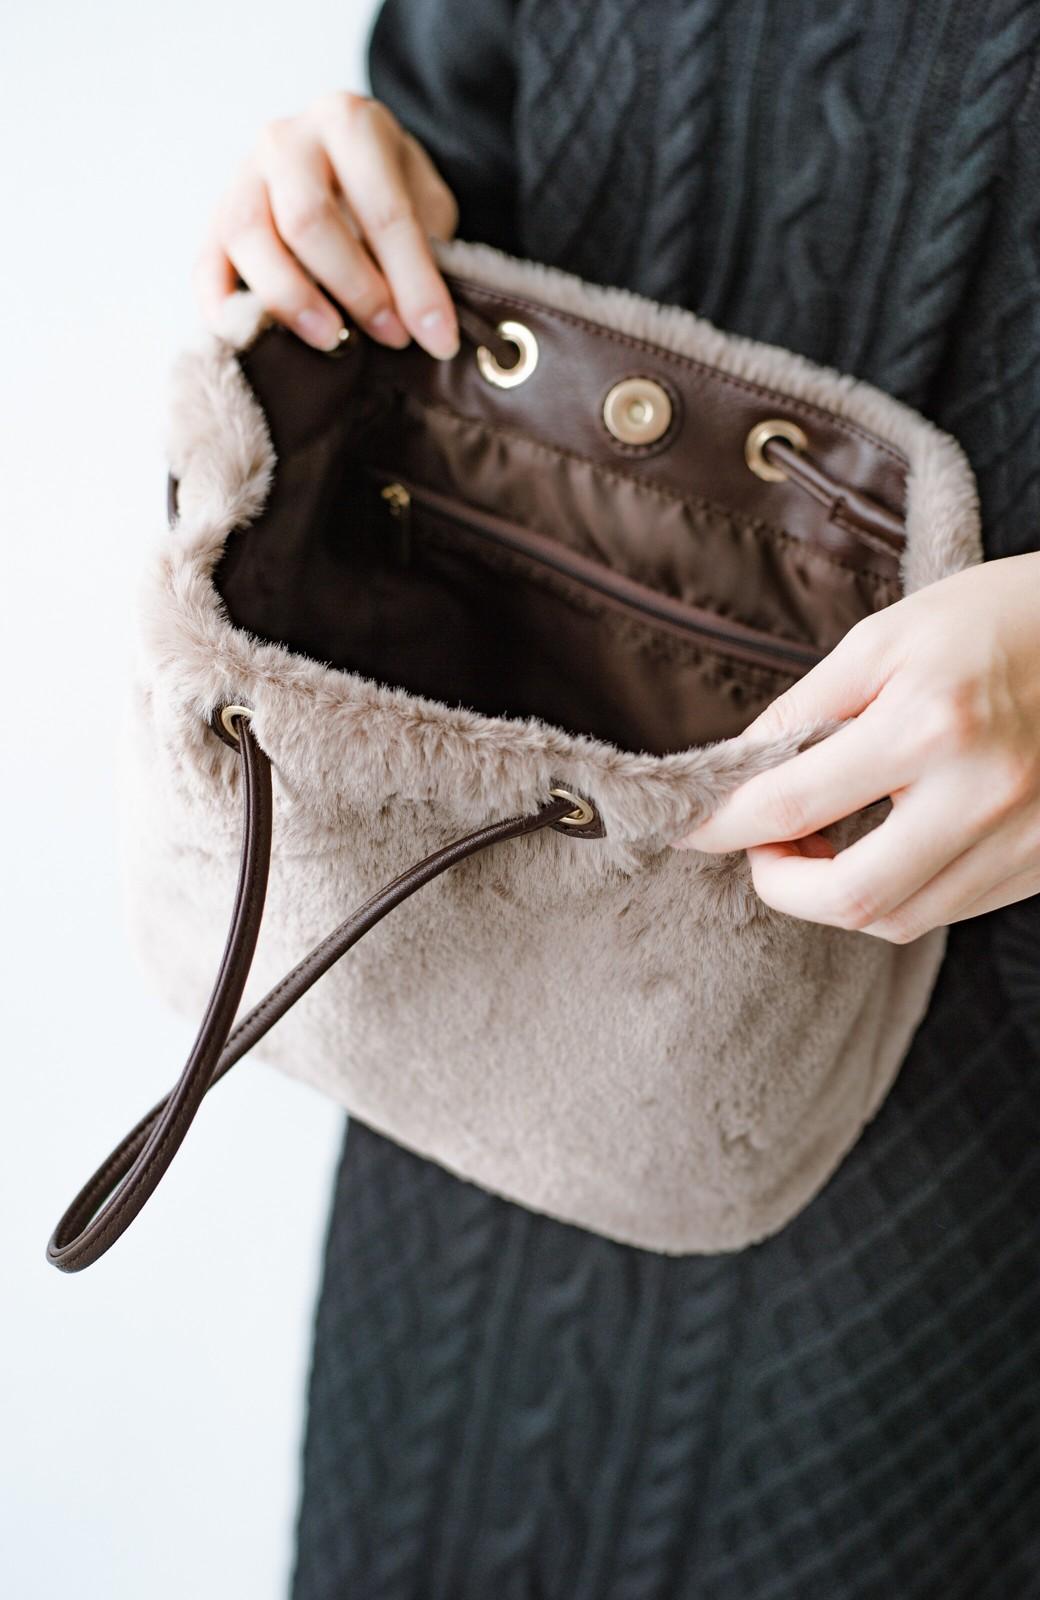 haco! さっと持って気分が上がる ふわっとかわいいエコファー巾着バッグ <グレイッシュベージュ>の商品写真9